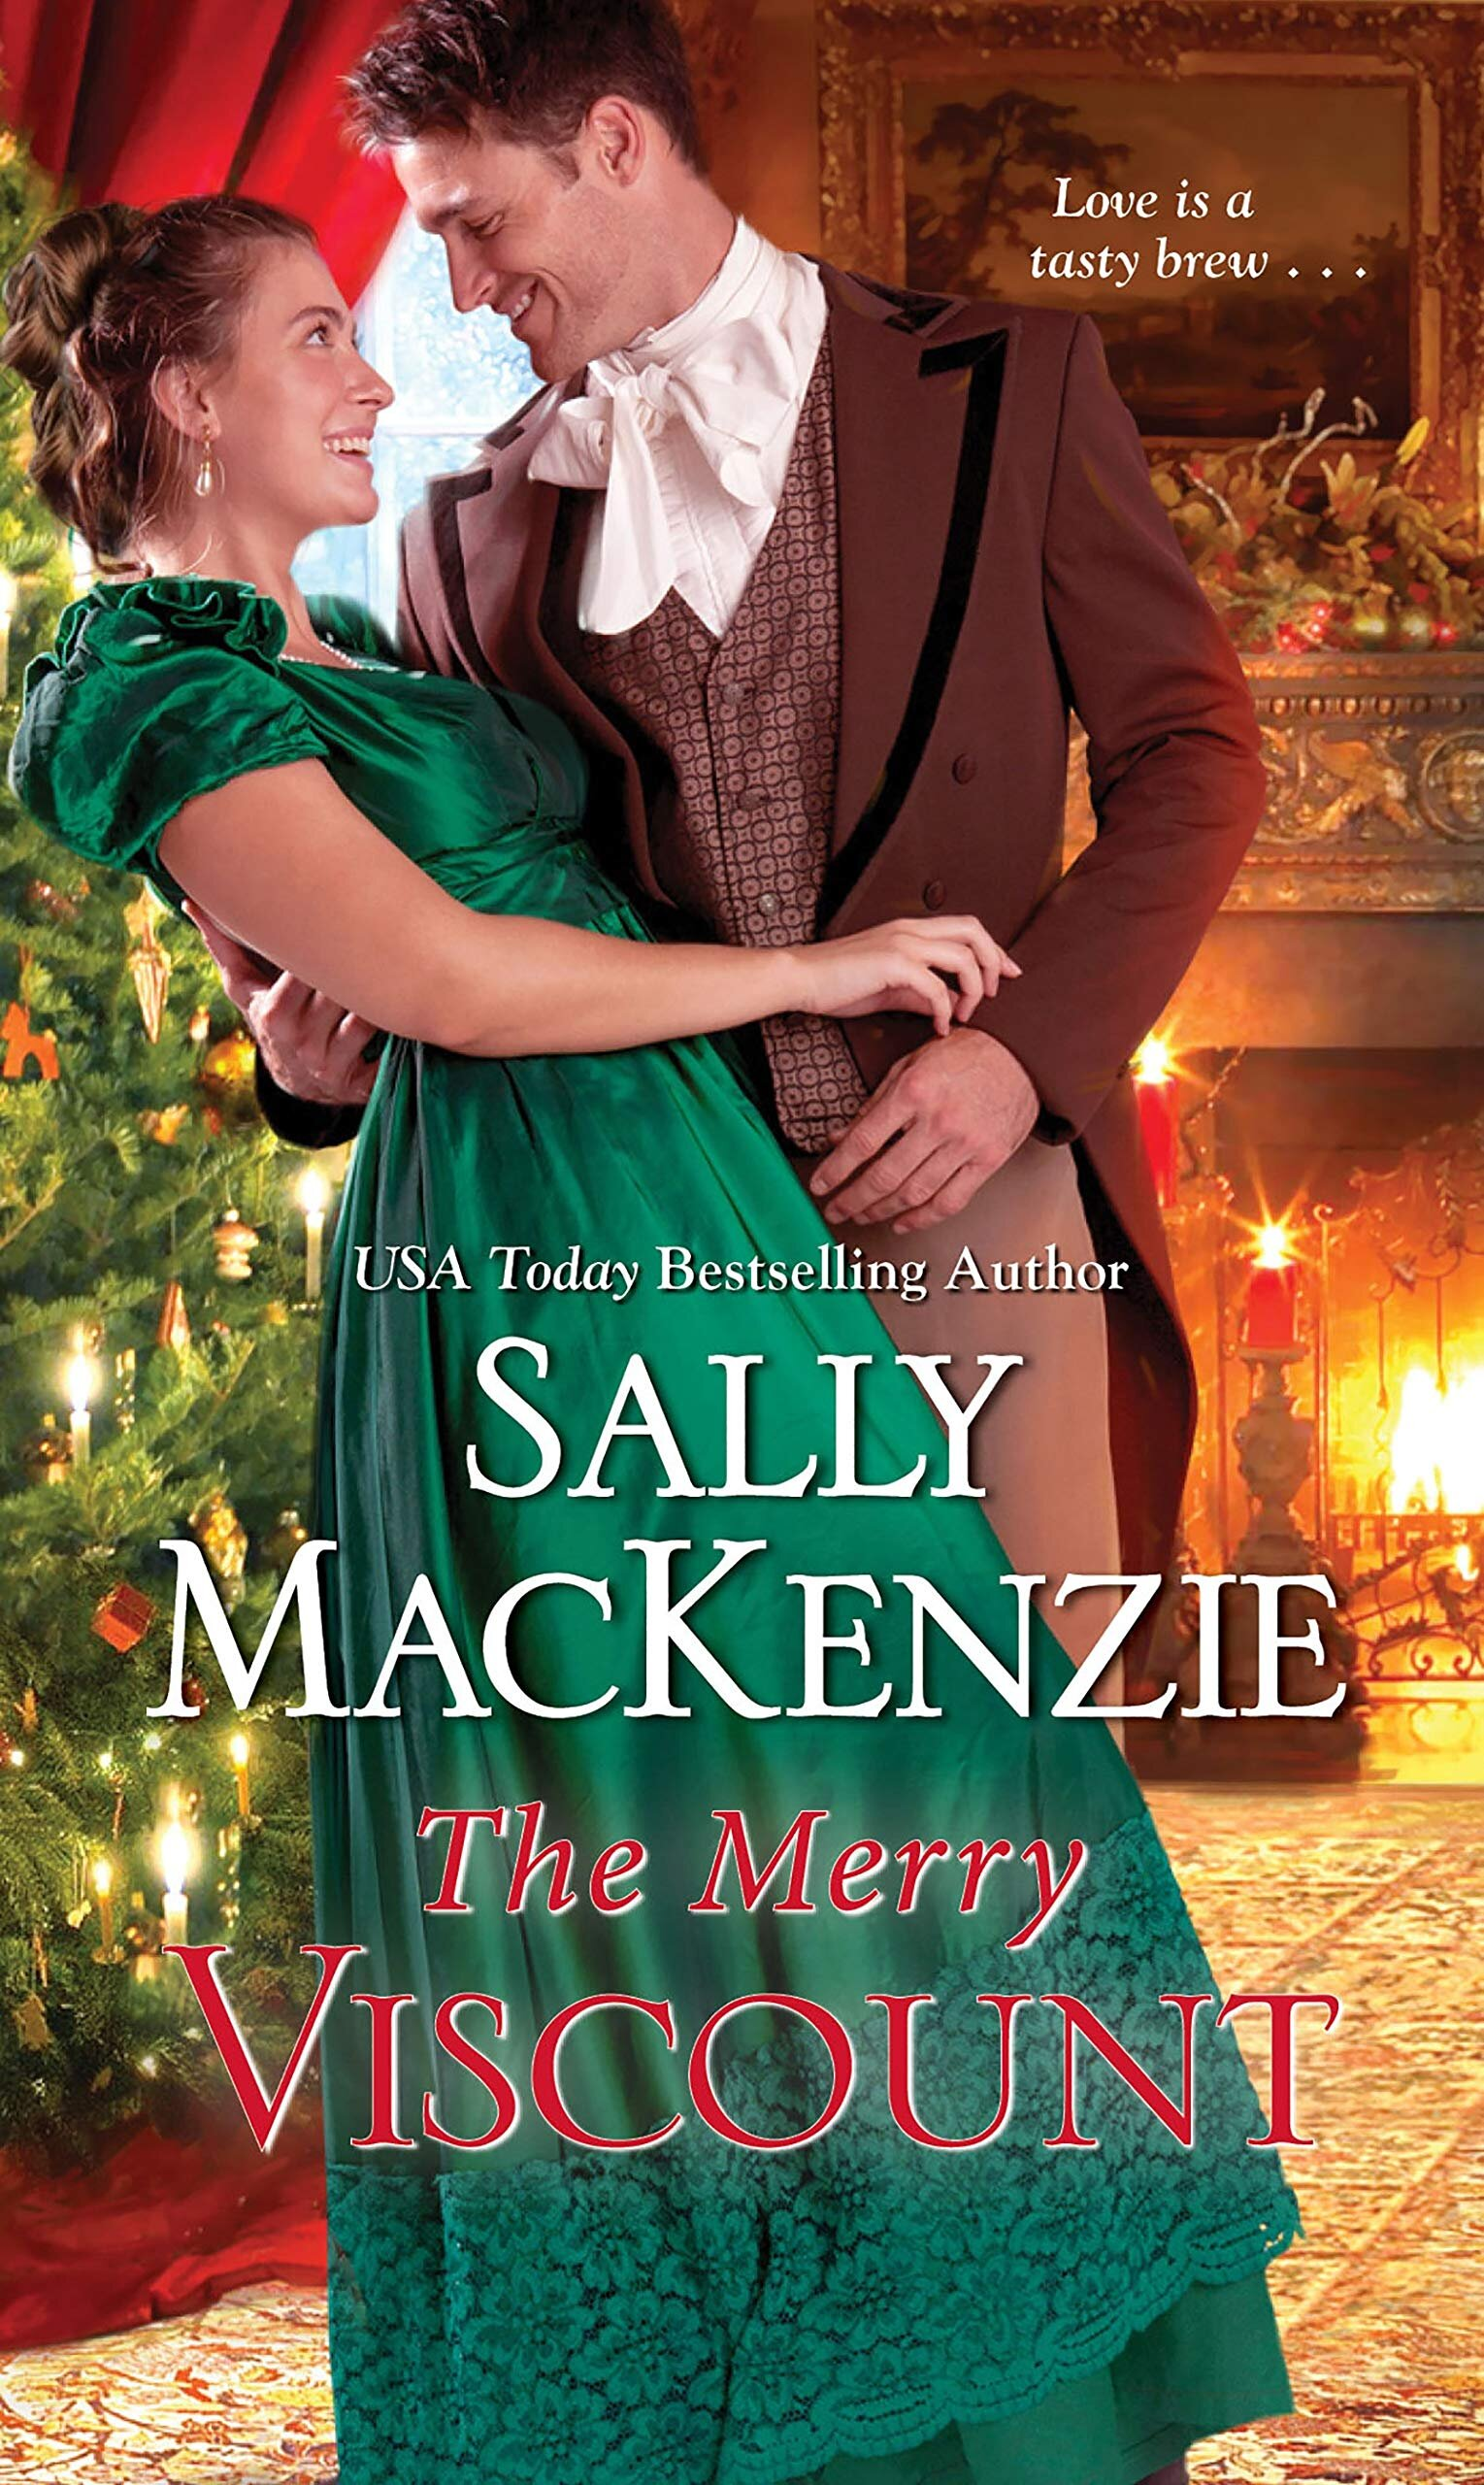 The Merry Viscount by Sally Mackenzie